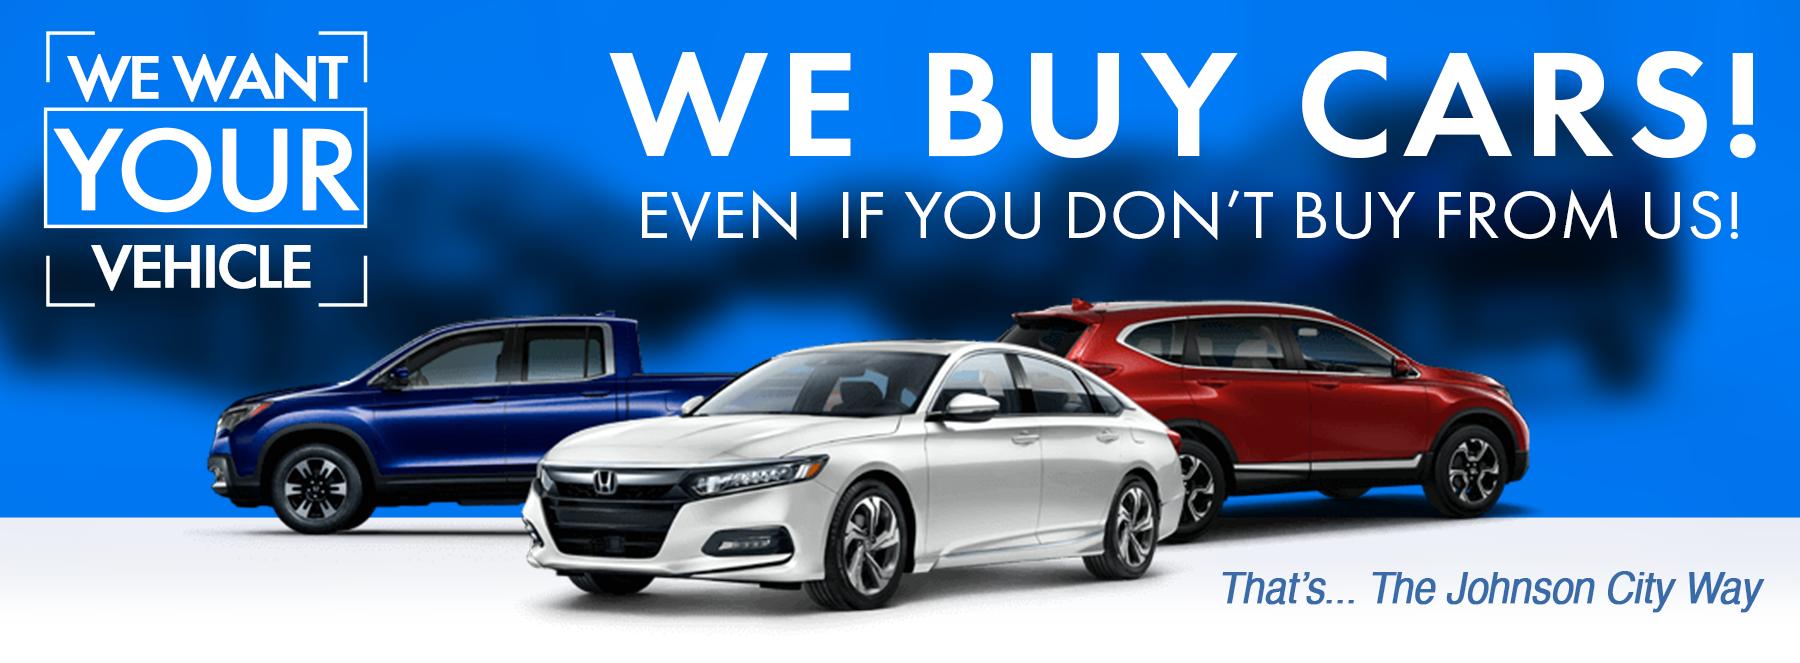 JCH-We Buy Cars-0721